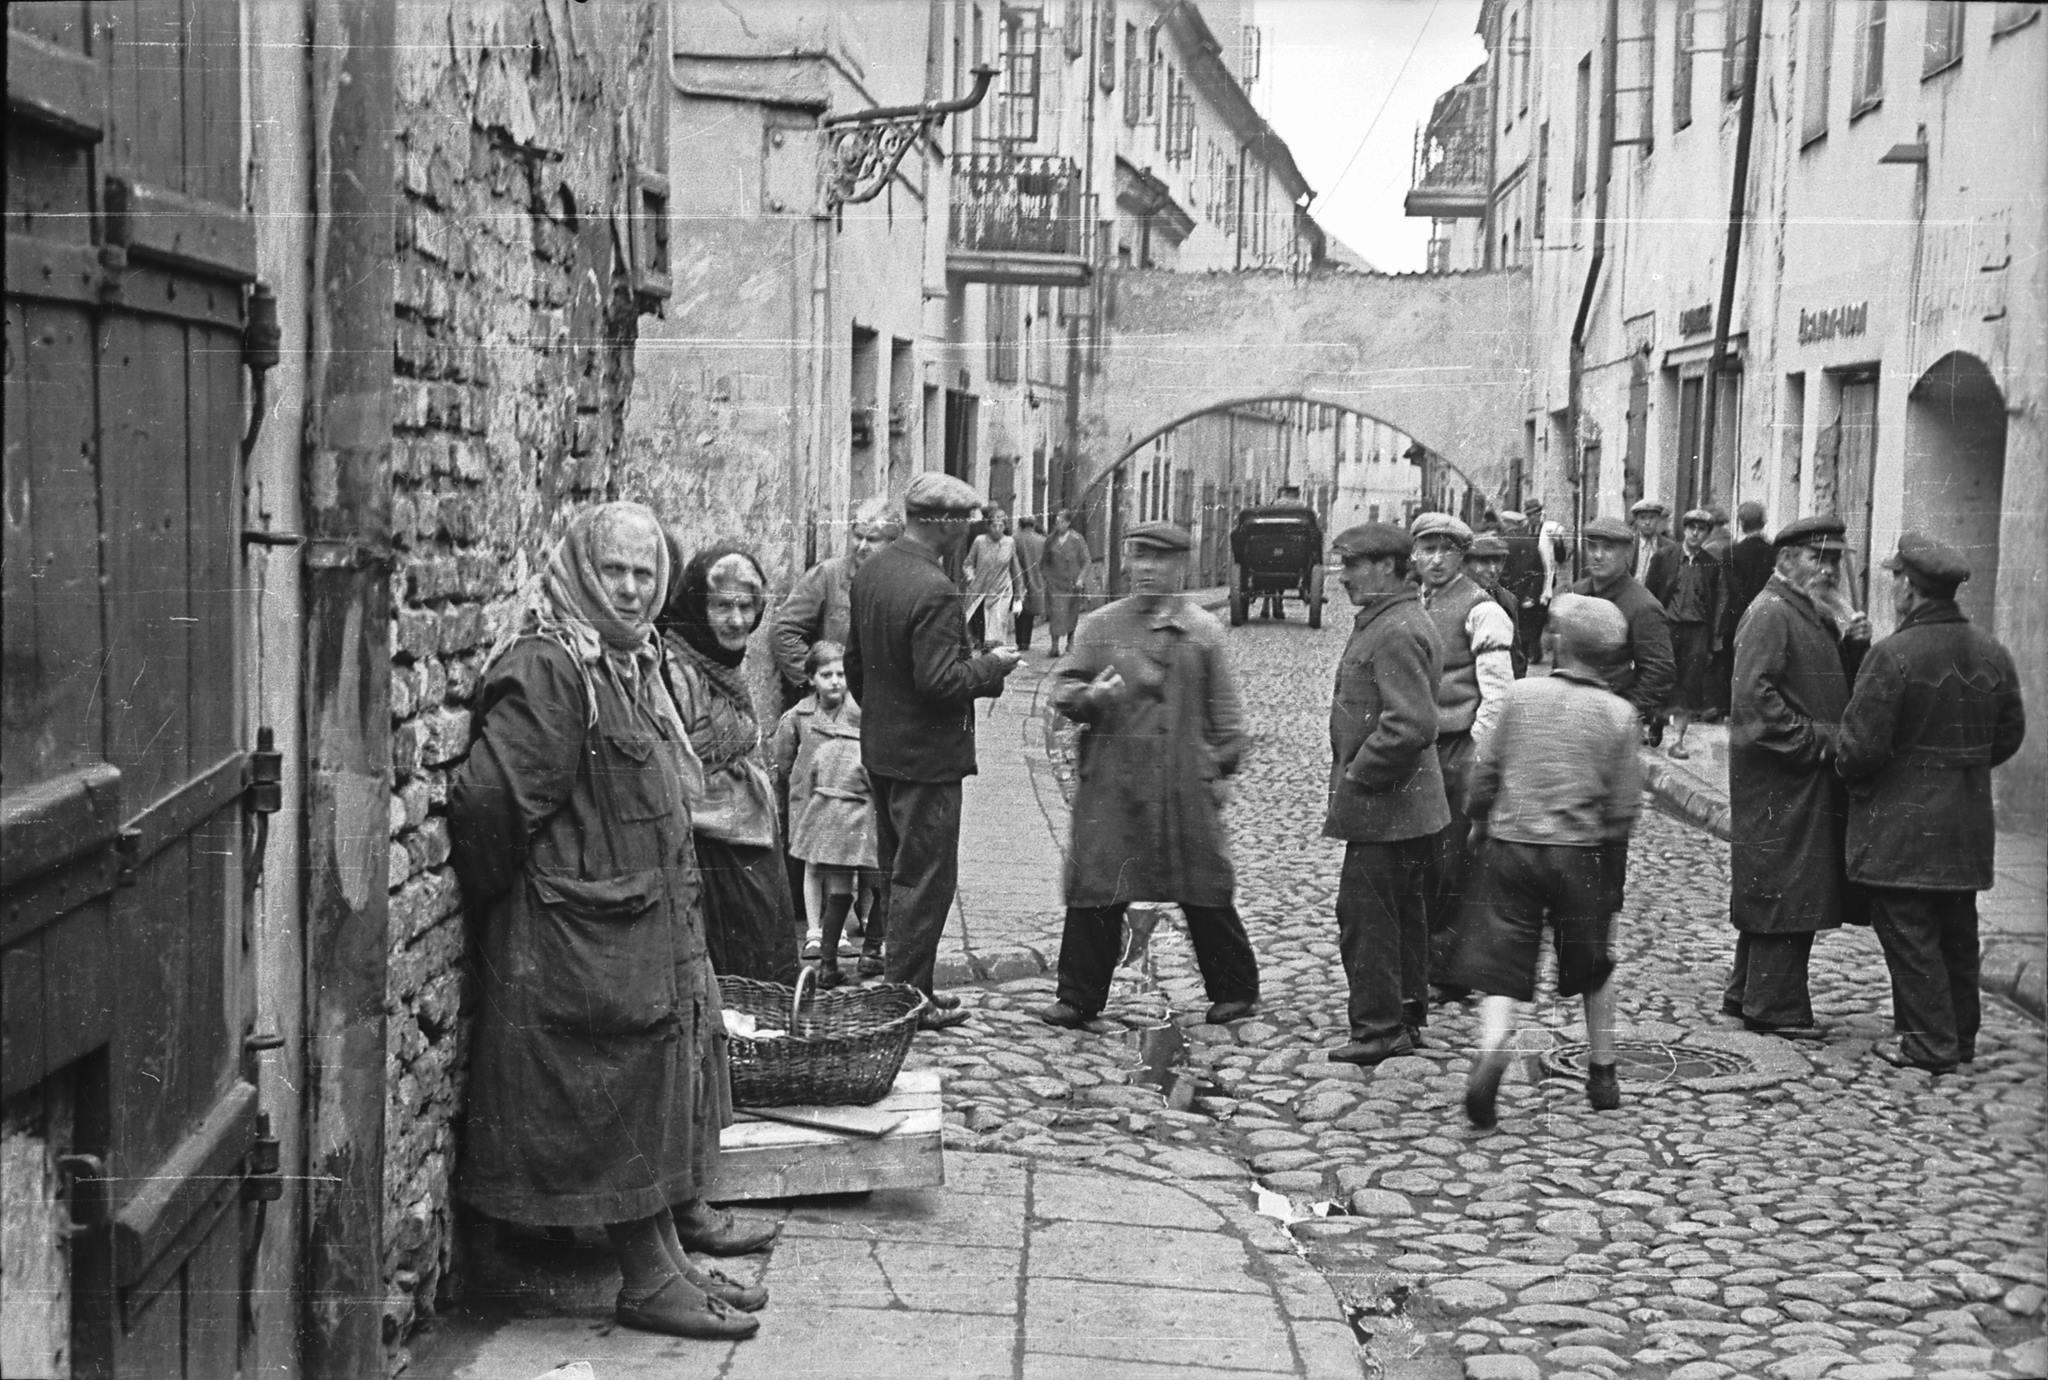 1940. Еврейский квартал. 9 июня